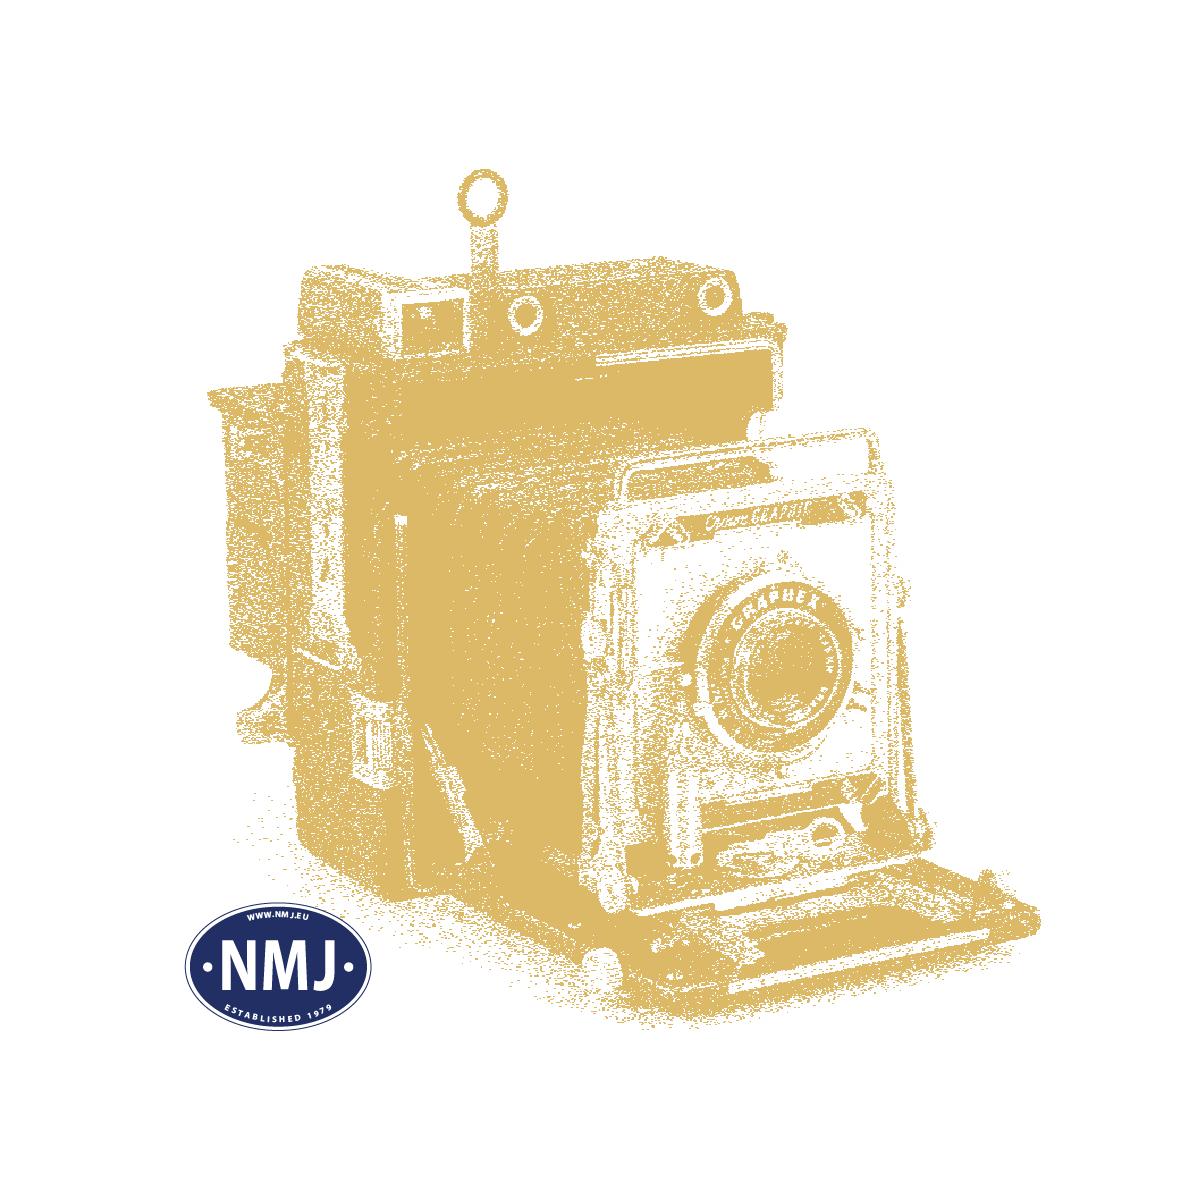 NMJT86.201 - NMJ Topline NSB El11.2107, Redbrown, DC